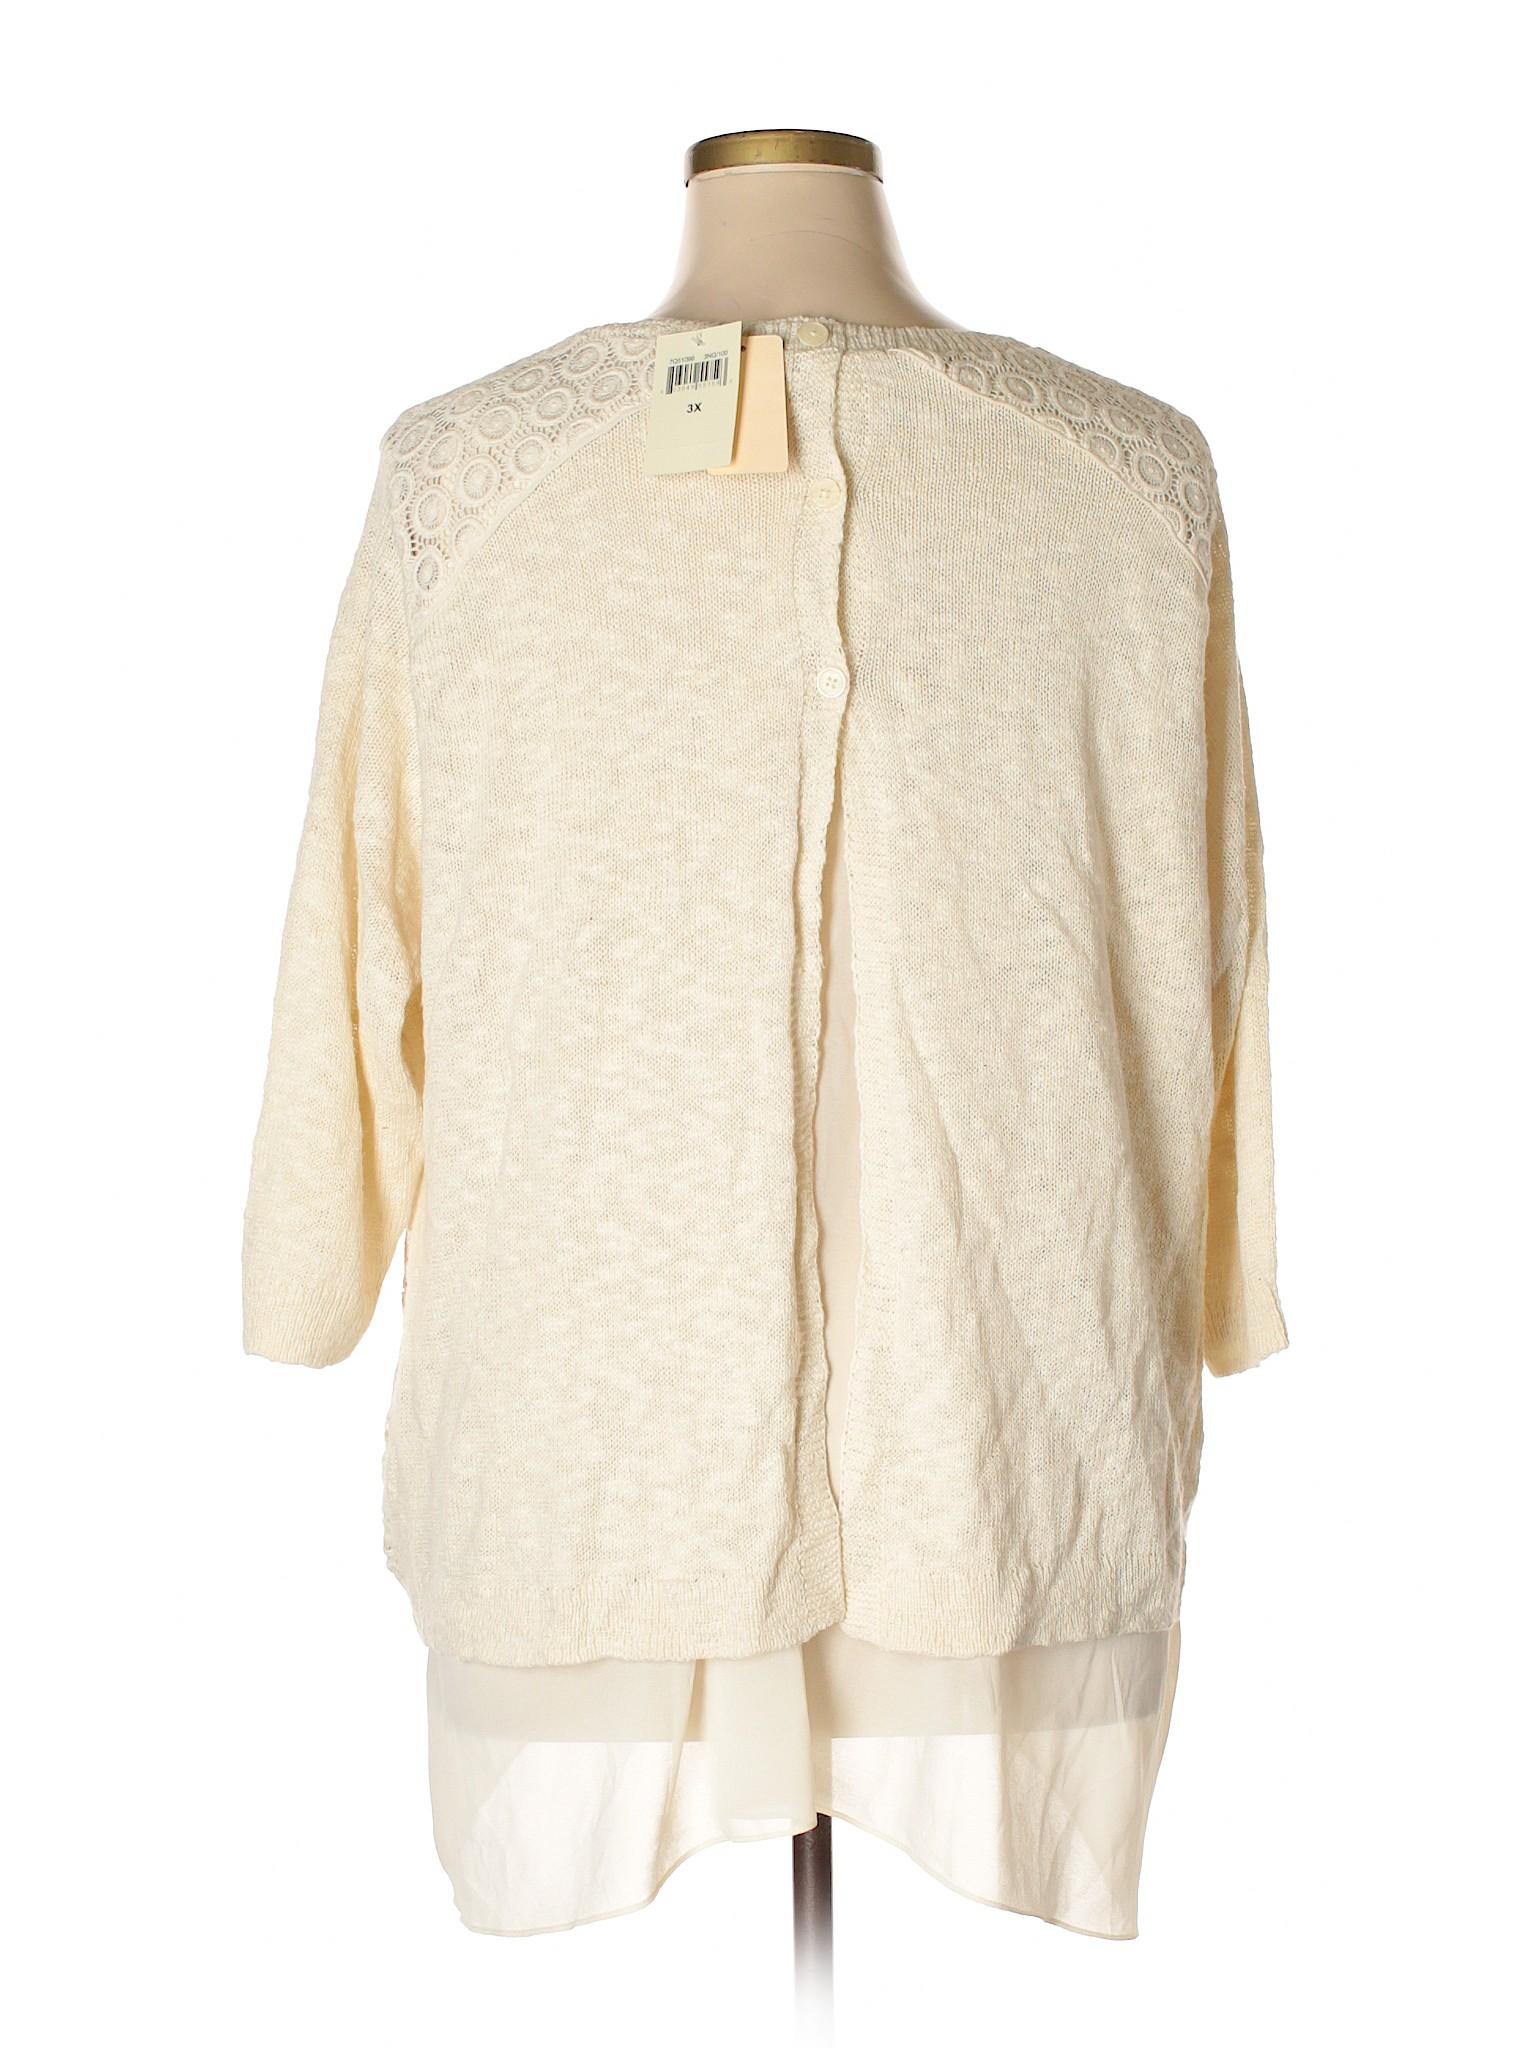 Lucky winter Sweater Pullover Brand Boutique BRTwqxz6